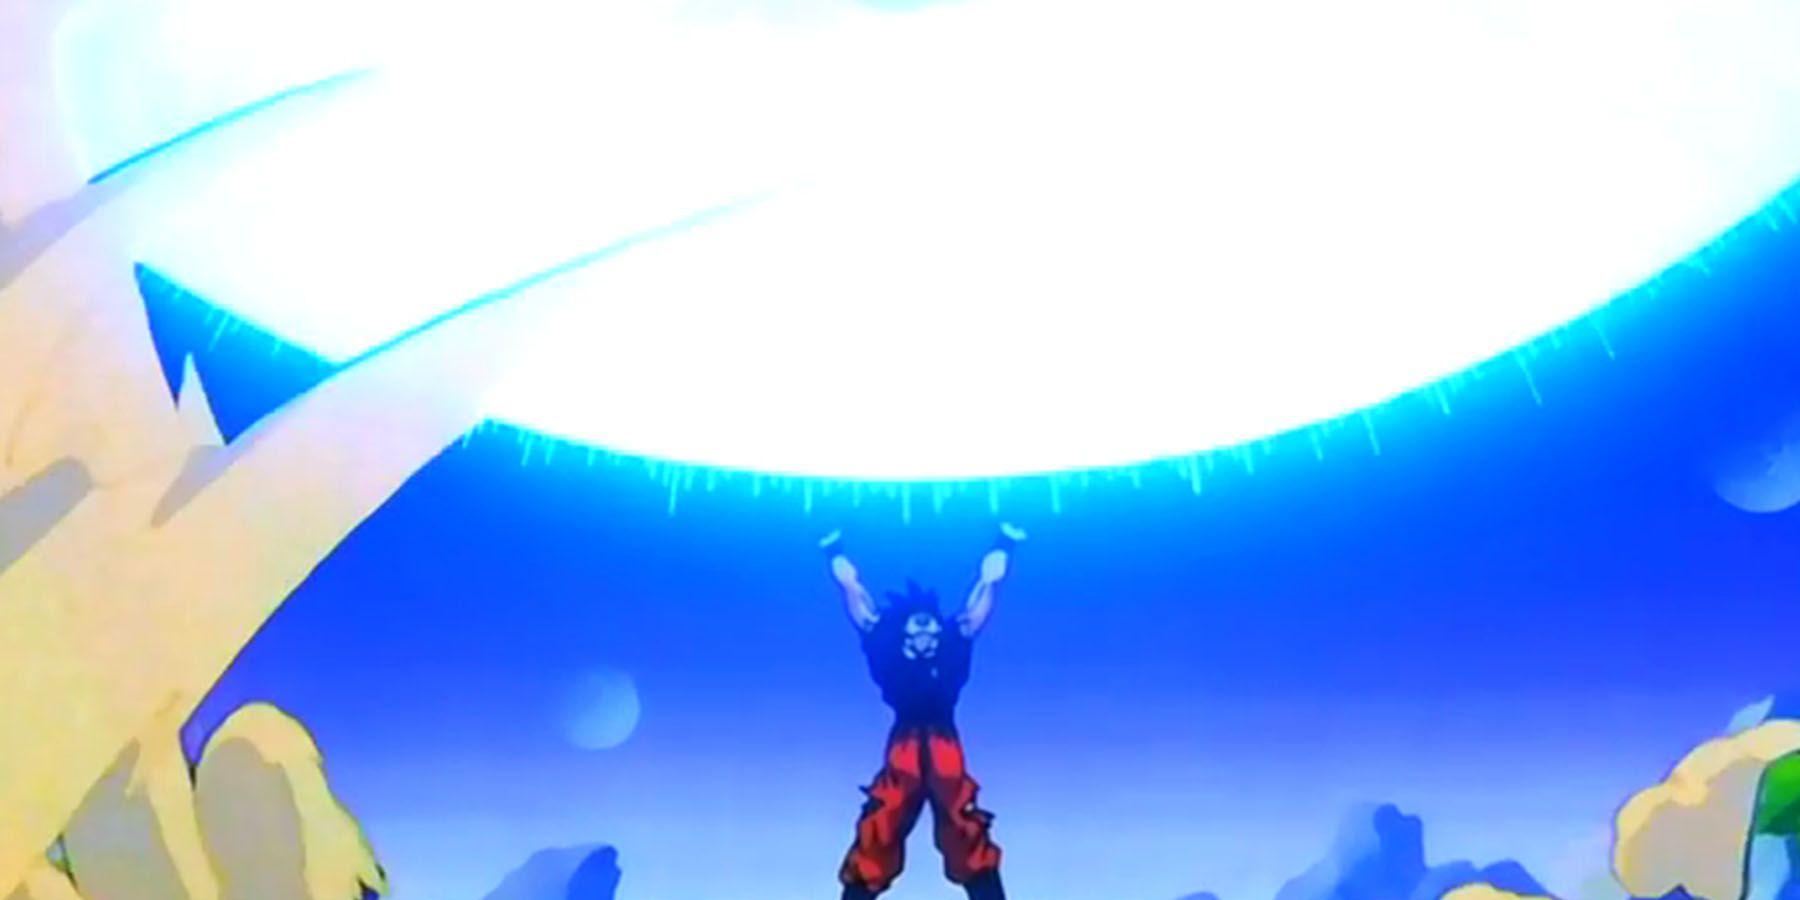 Dragon Ball: All the Times the Spirit Bomb Has Failed